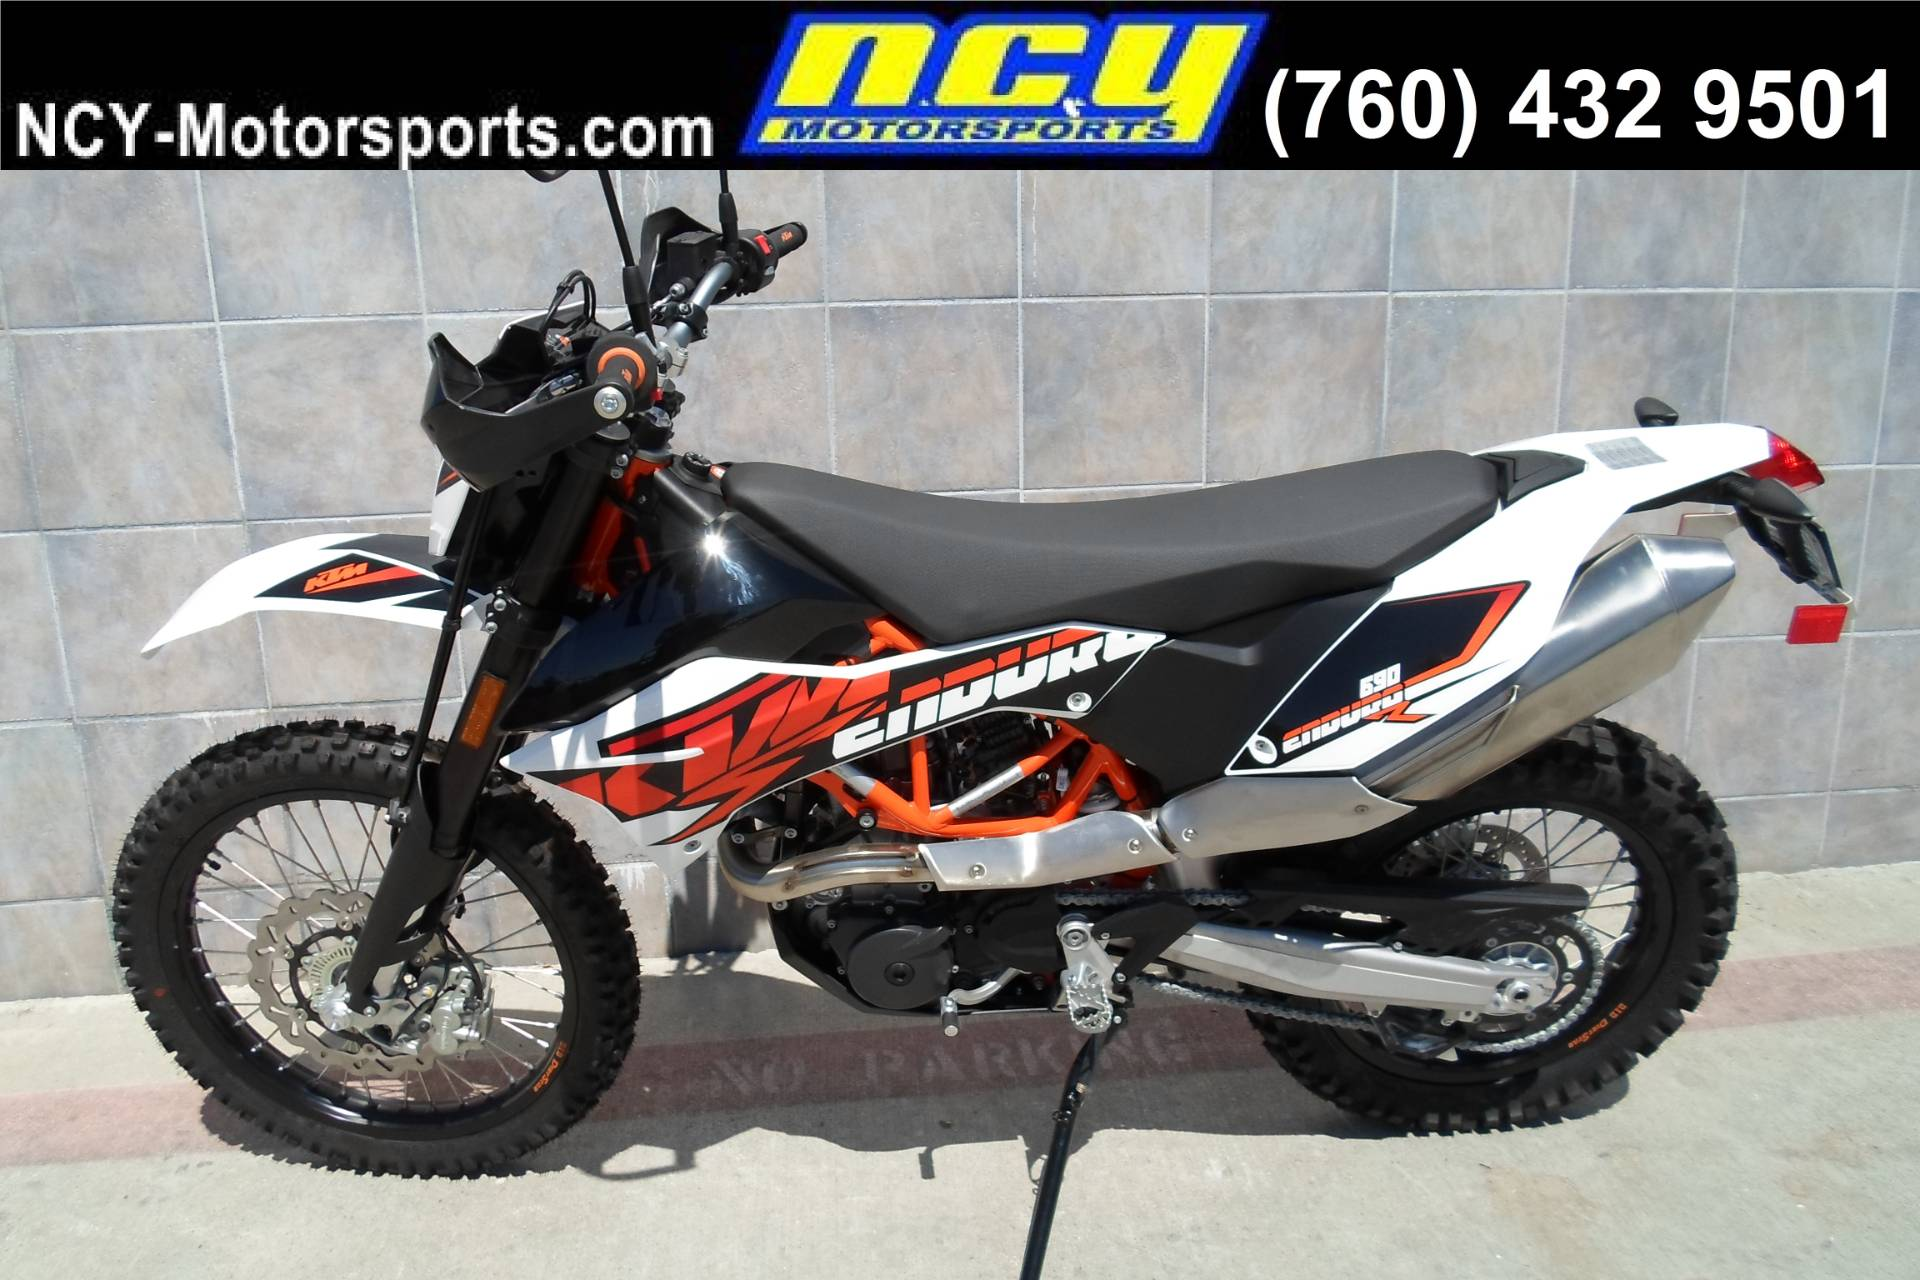 New 2018 KTM 690 Enduro R Motorcycles in San Marcos, CA